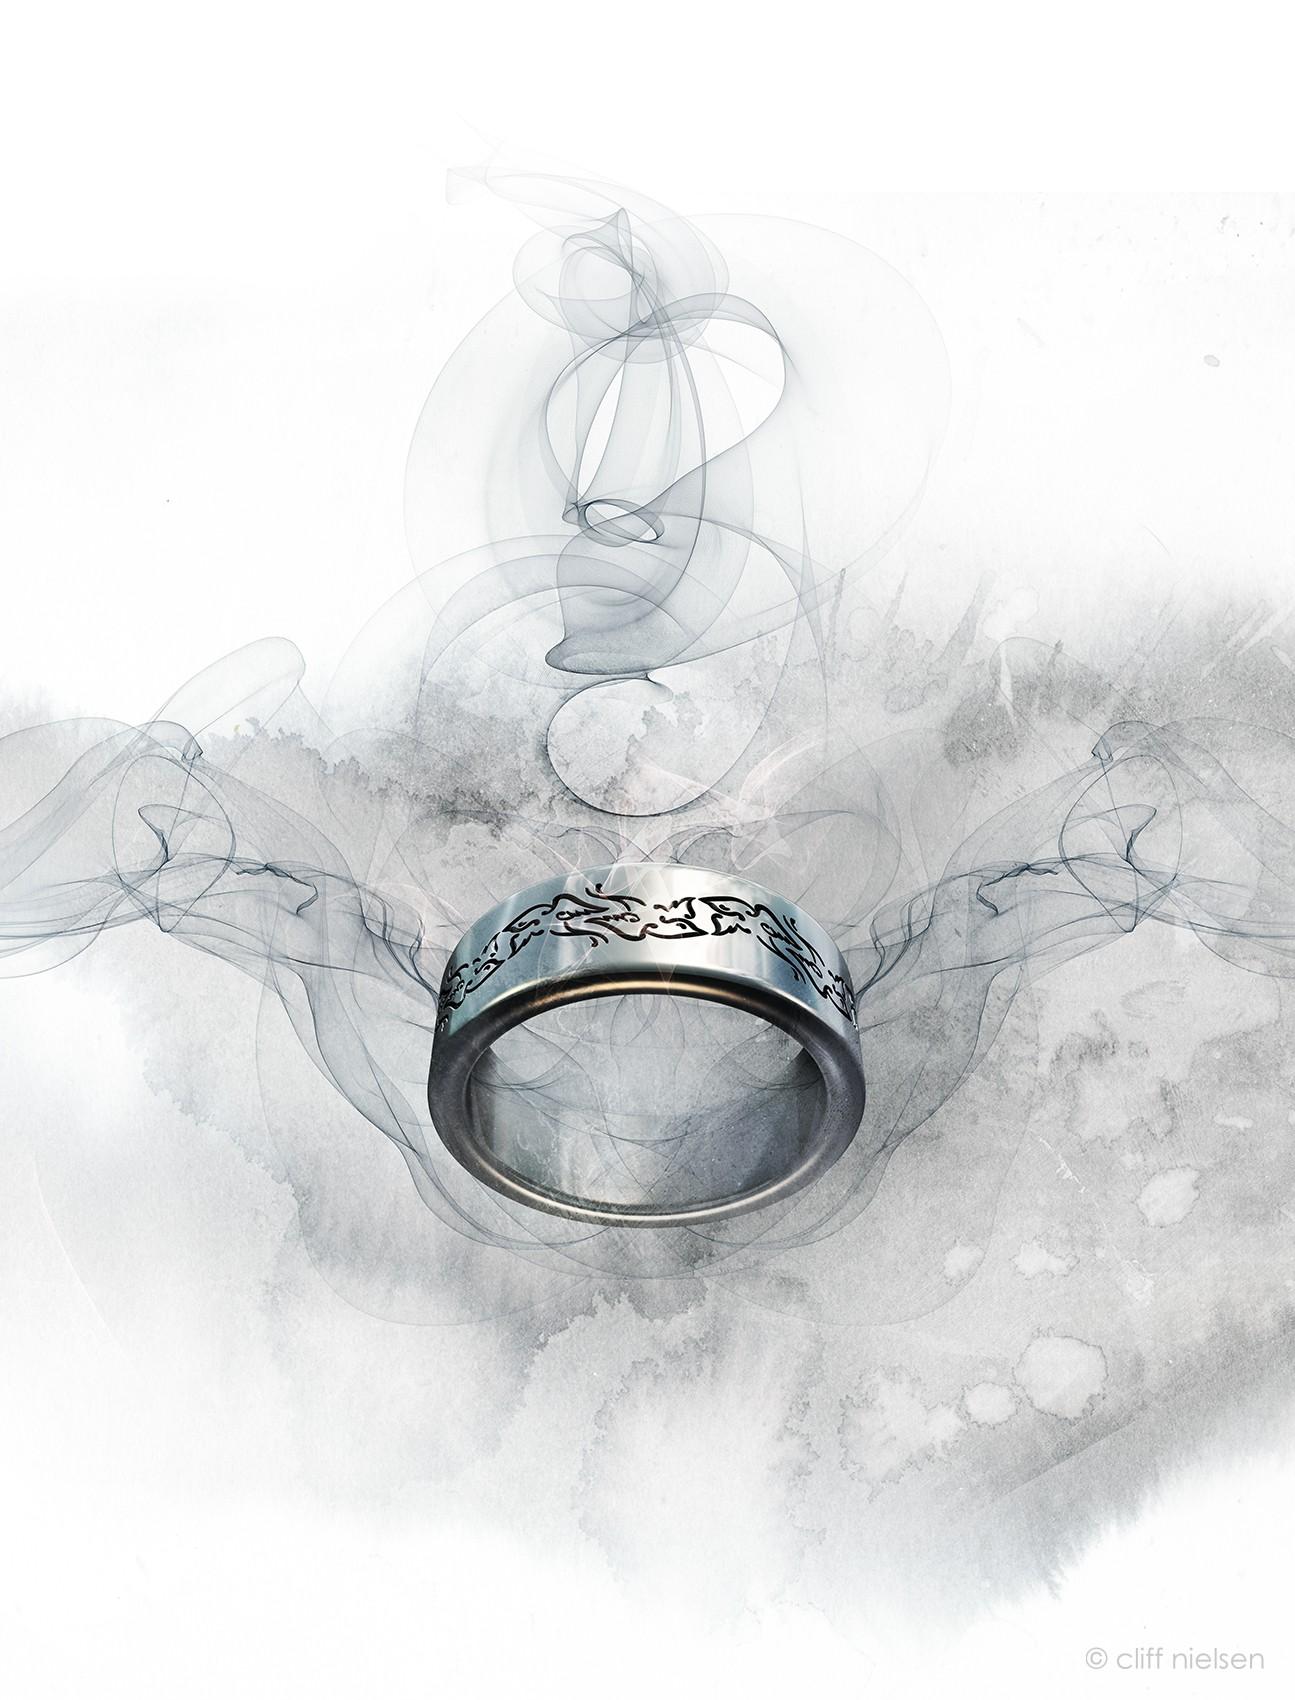 Ring guard wiki